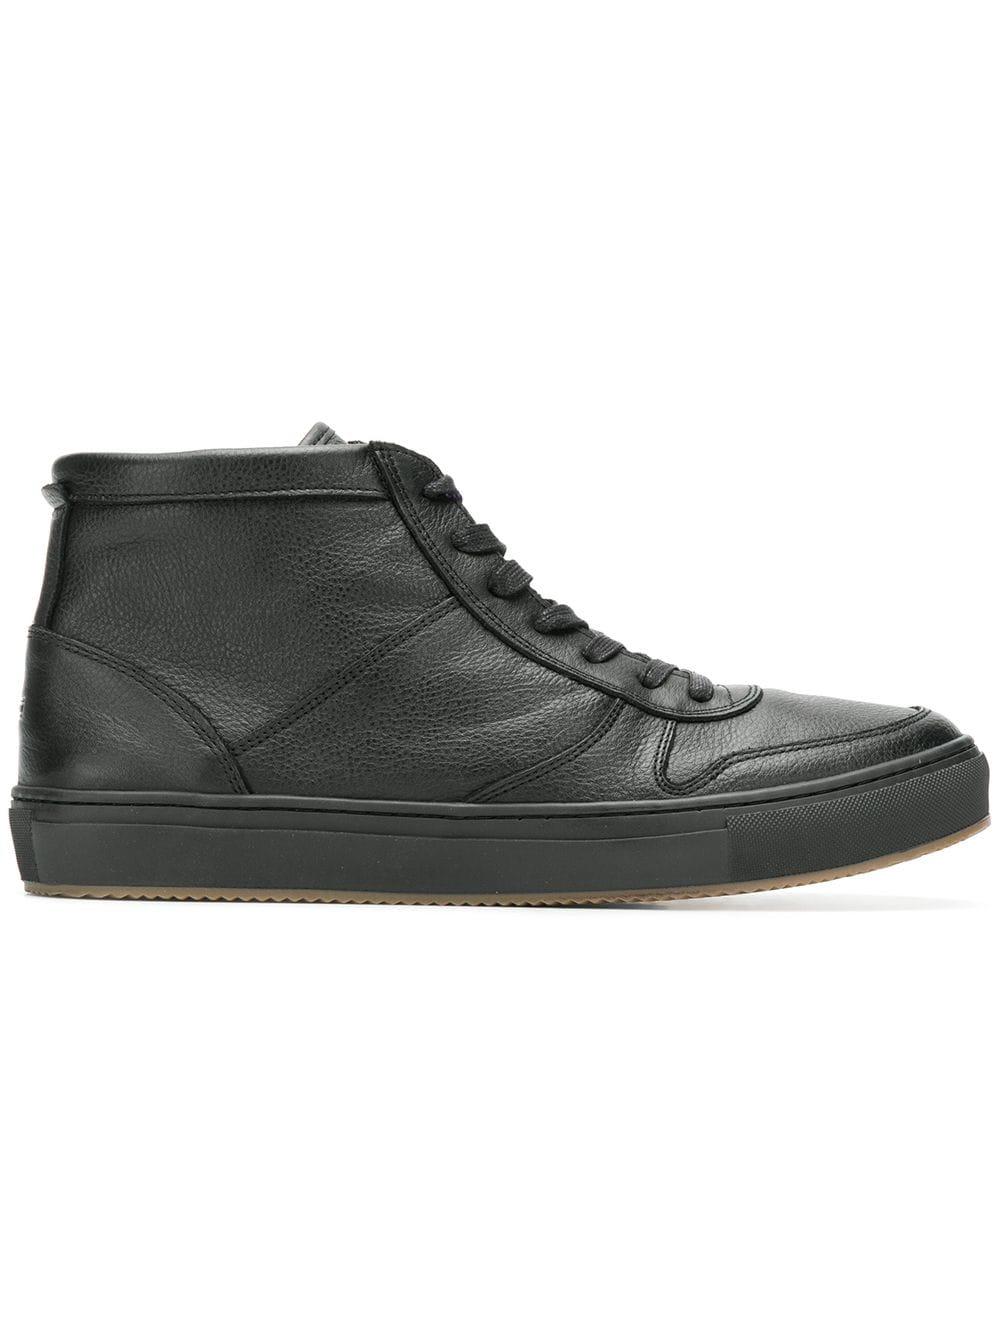 8d5d3ce4c483 Tommy Hilfiger hi-top leather sneakers - Black - Glami.cz